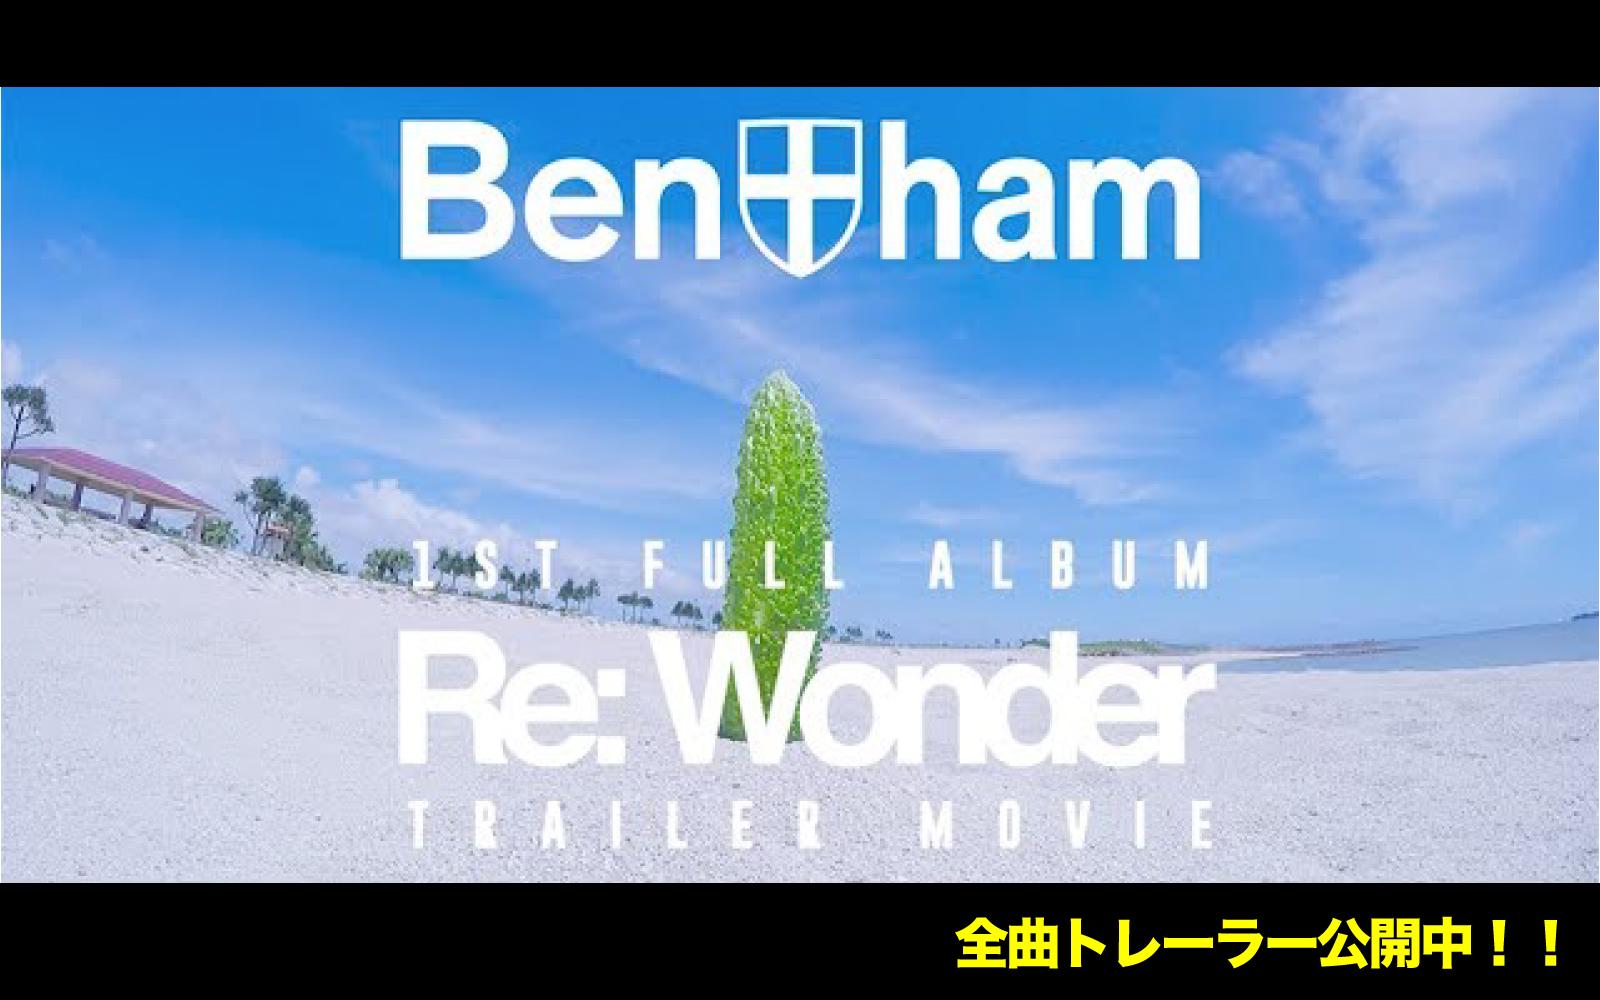 「Re:Wonder」全曲トレーラー公開中!